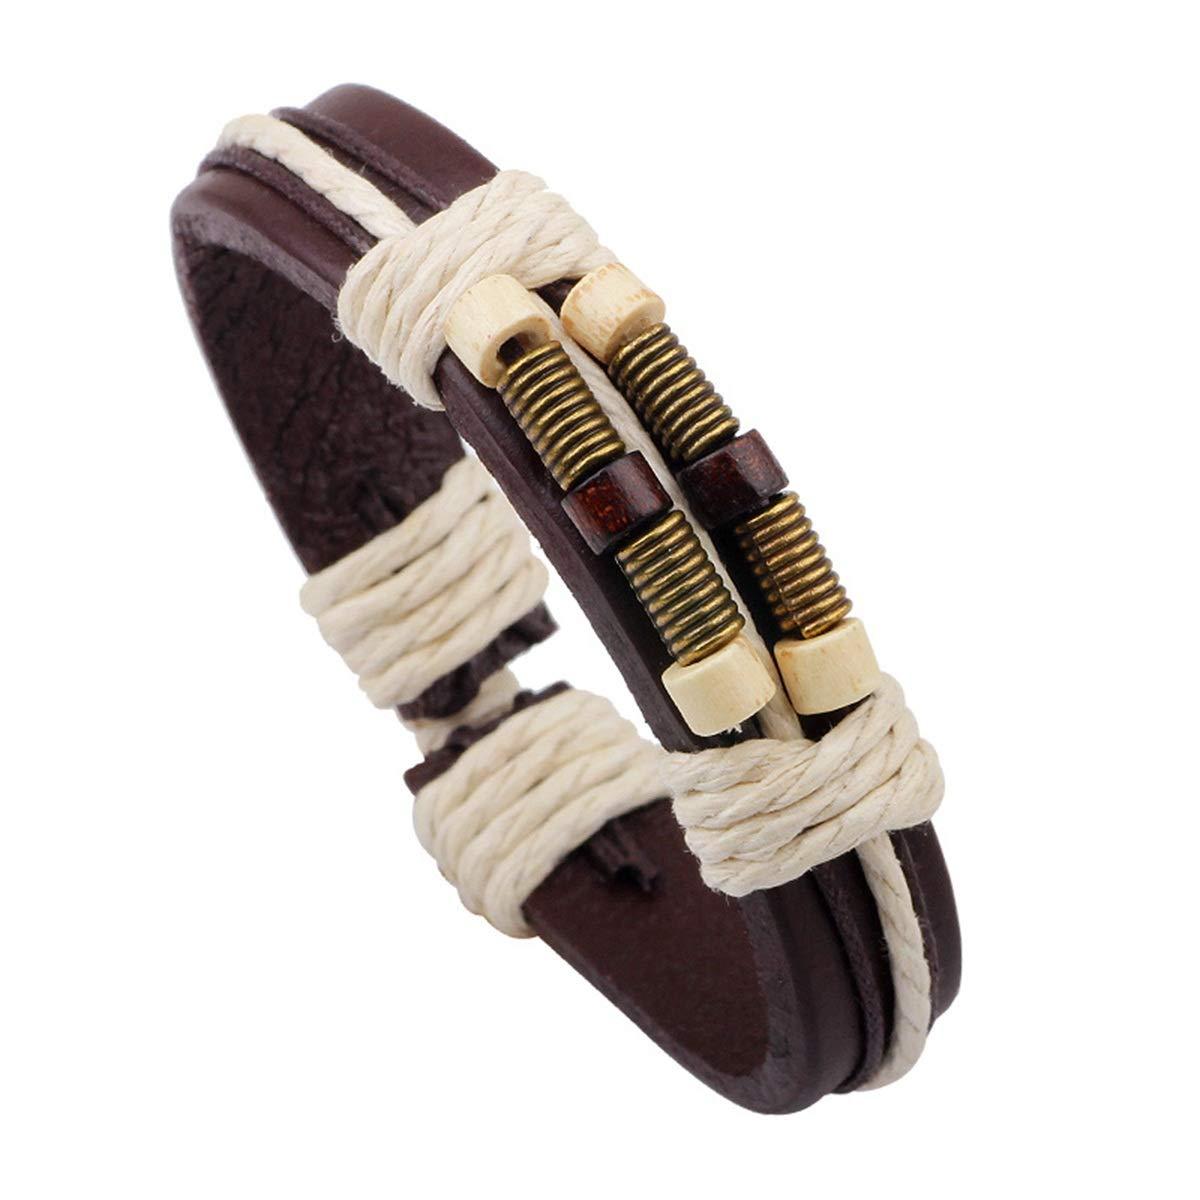 Haisiluo Personalized Bracelet Wooden Bead Bracelet Handmade Woven Bracelet